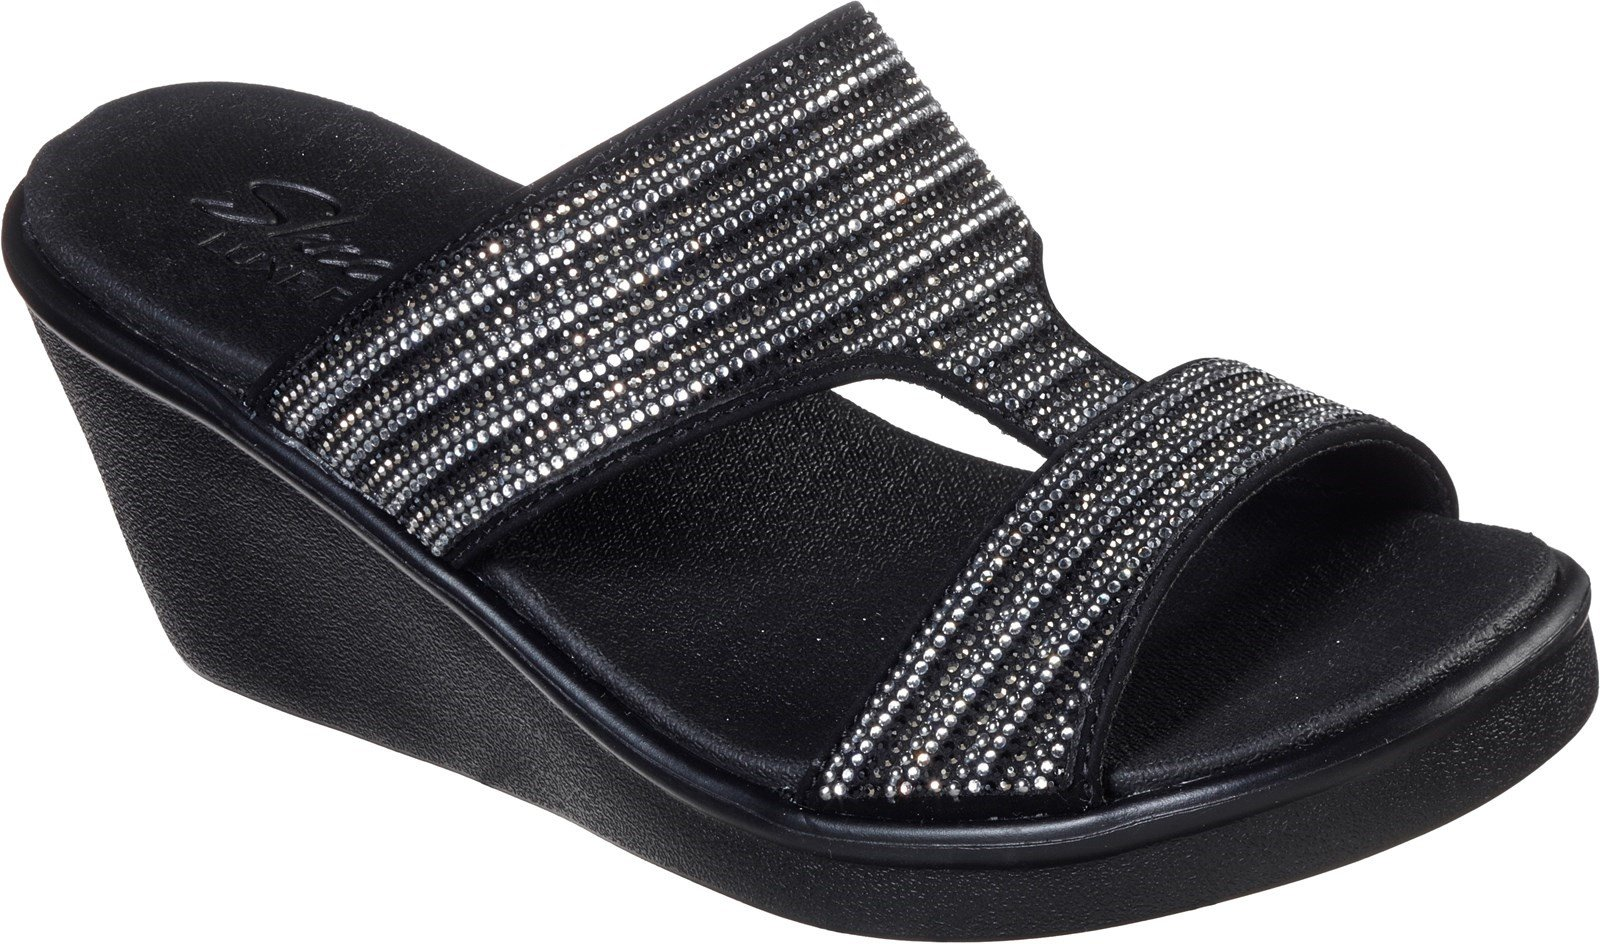 Skechers Women's Rumble On Bling Gal Summer Sandal Multicolor 32166 - Black/Silver 5